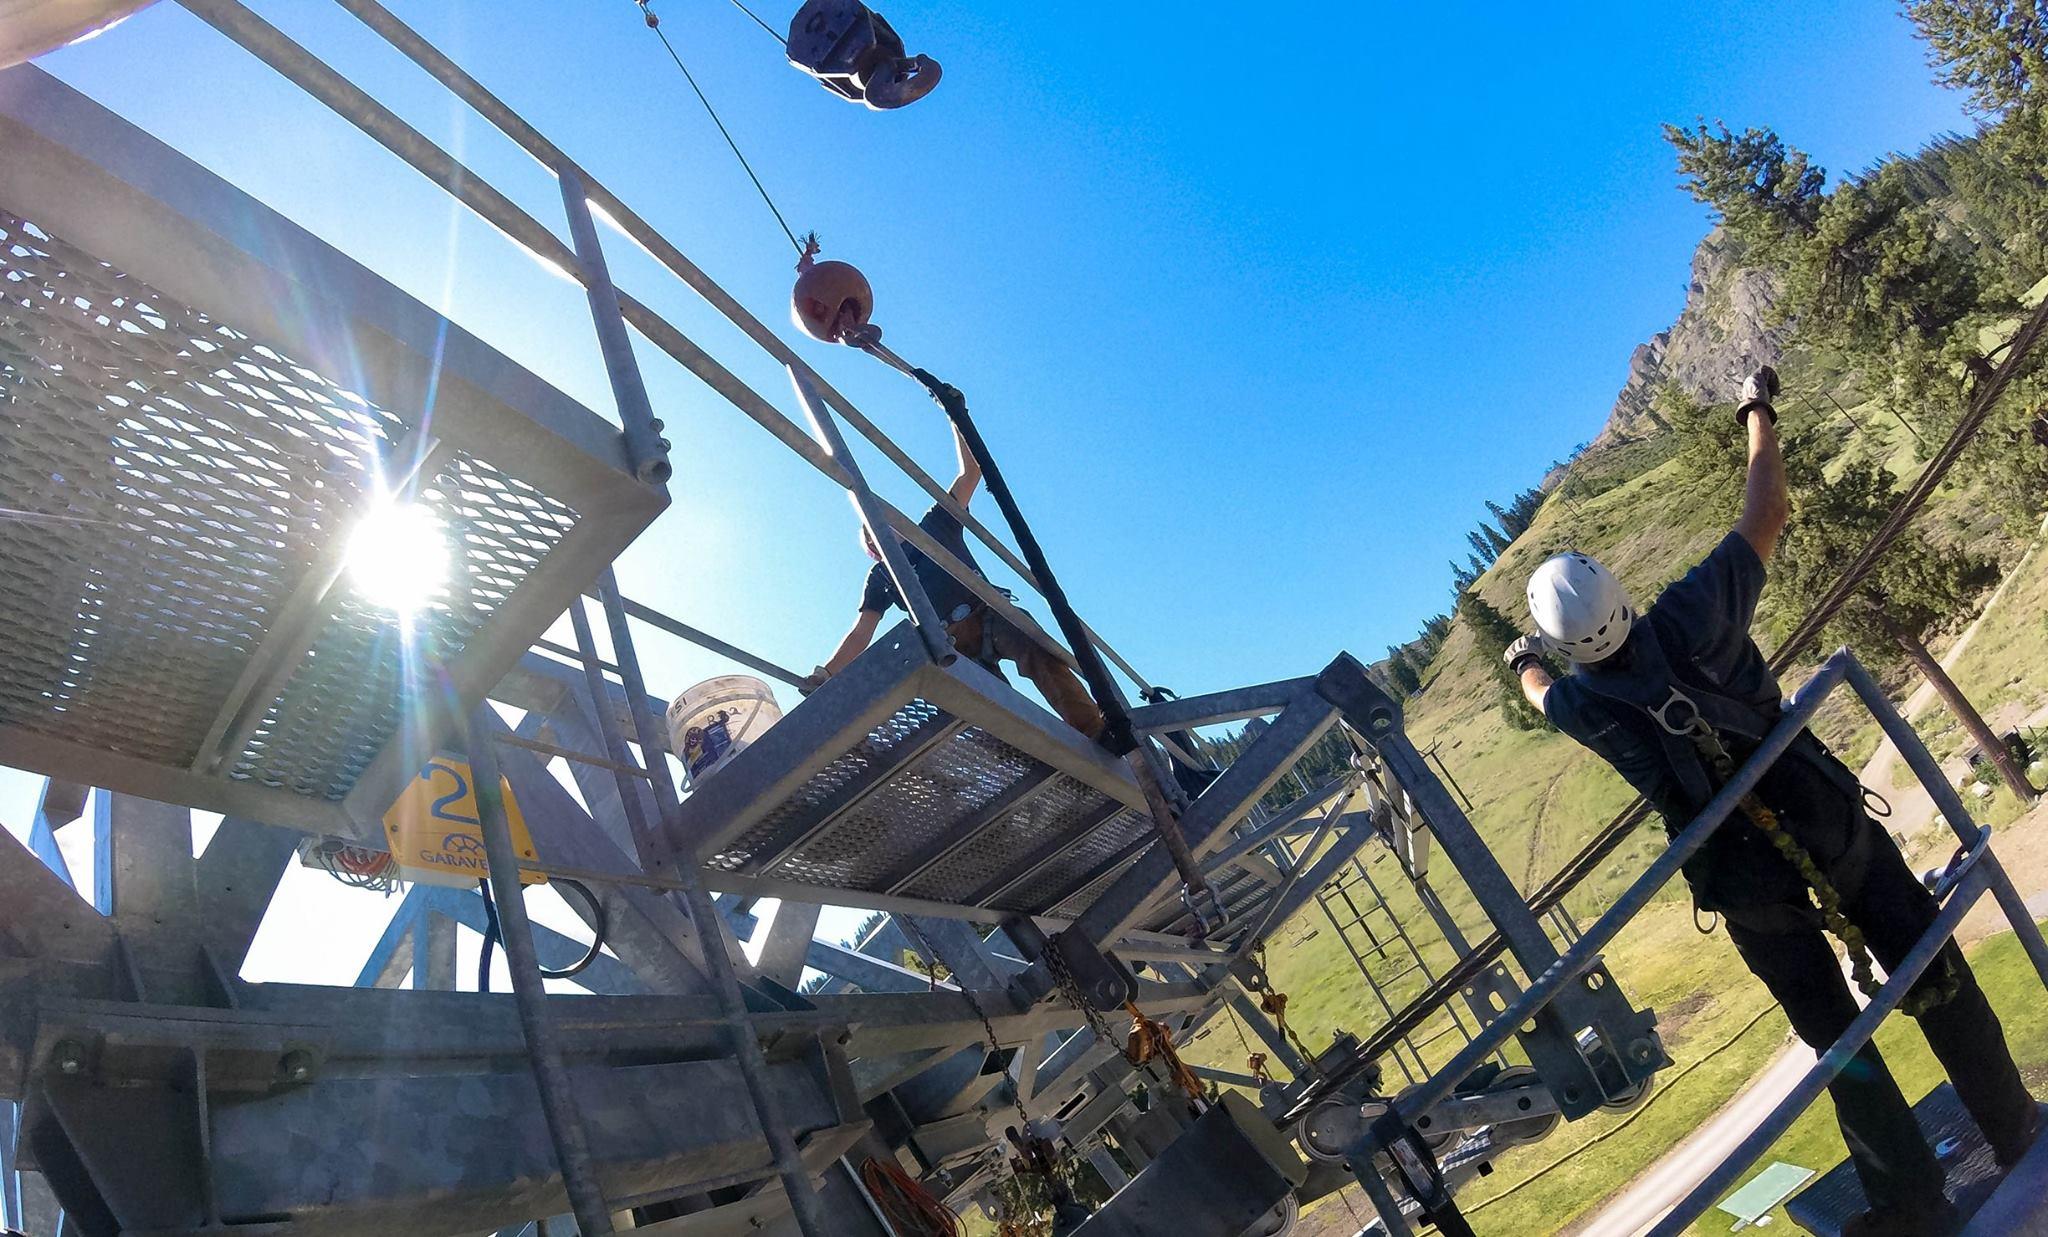 new lift at Squaw